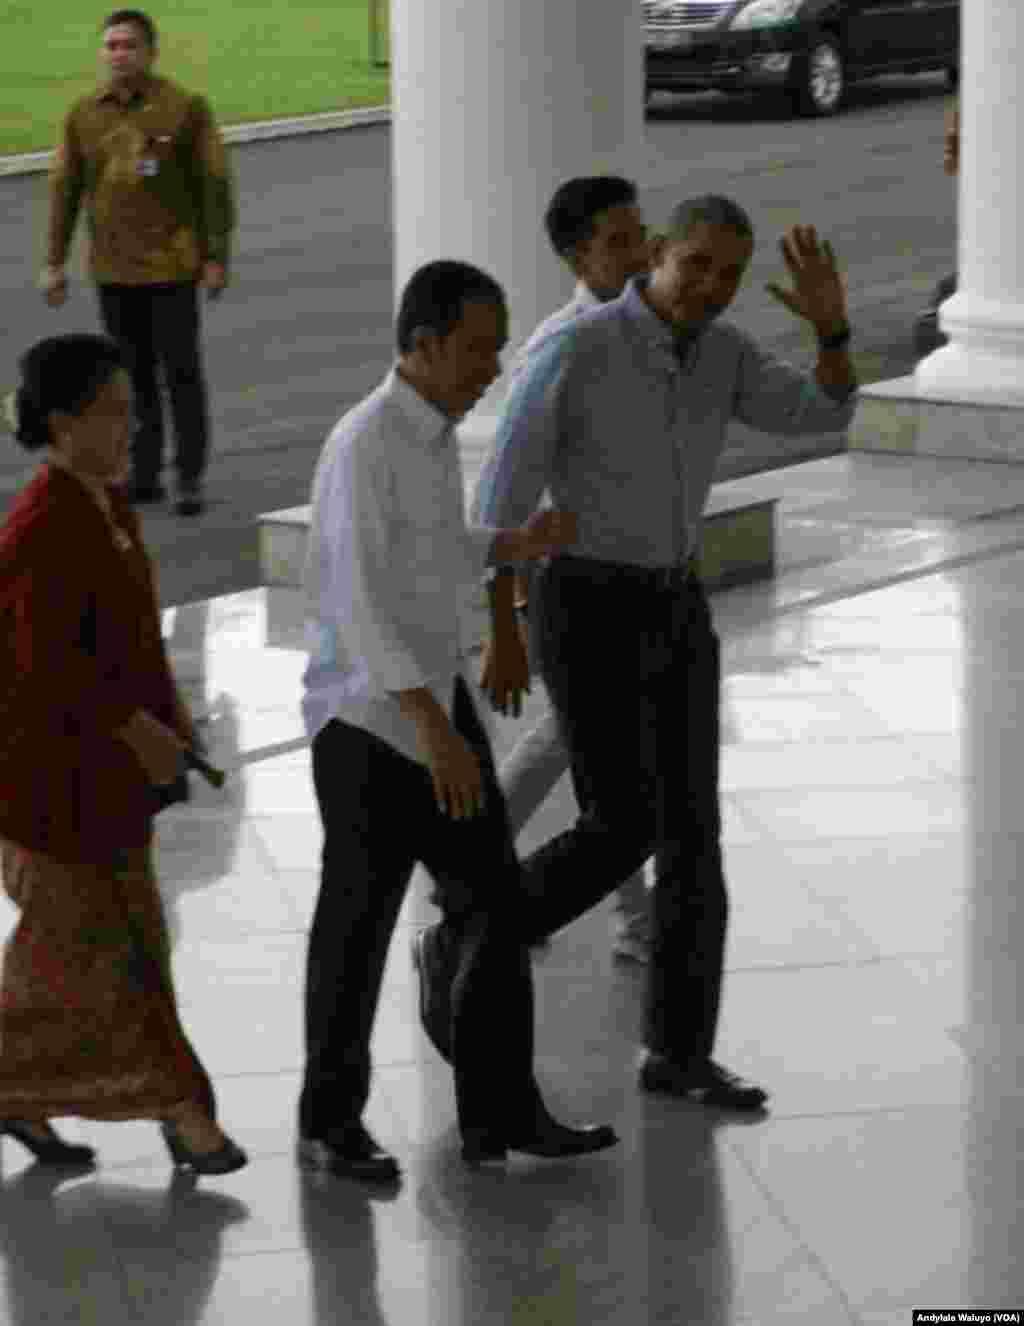 Presiden Joko Widodo Sambut Kedatangan Mantan Presiden AS Barack Obama di Istana Bogor (foto: VOA/Andylala Waluyo)